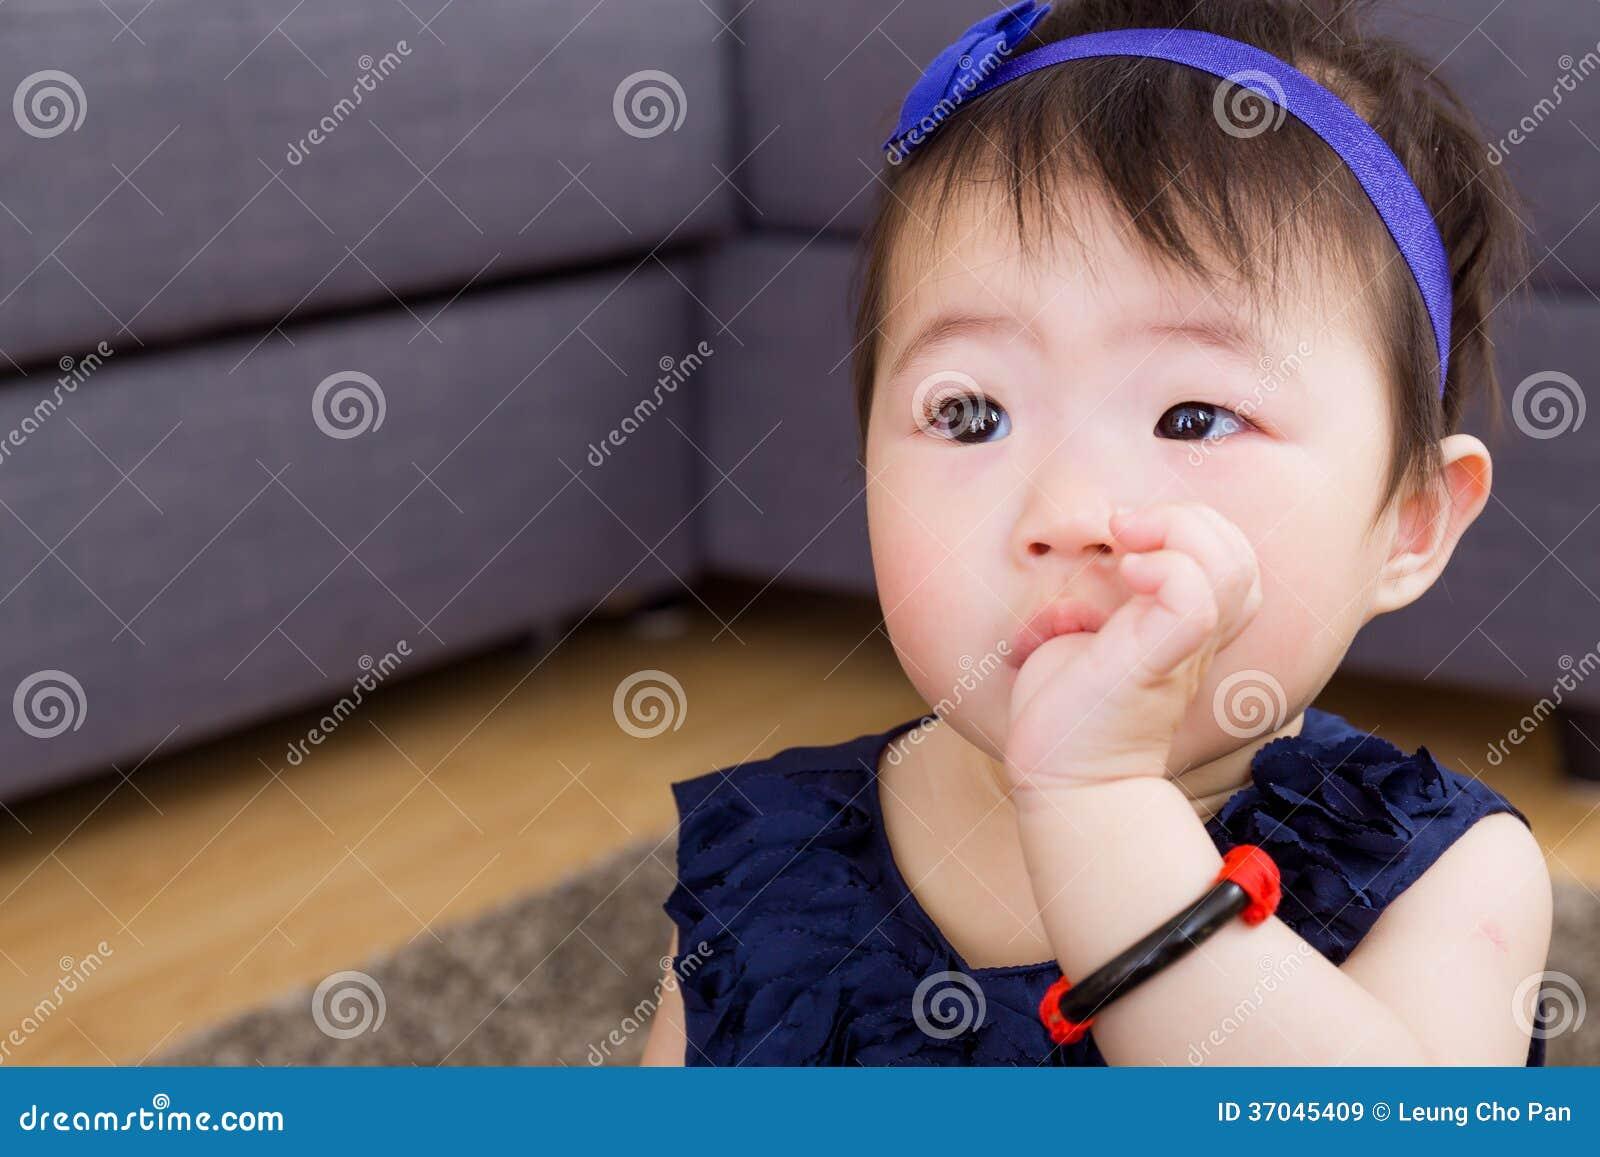 Младенец всасывая палец в рте